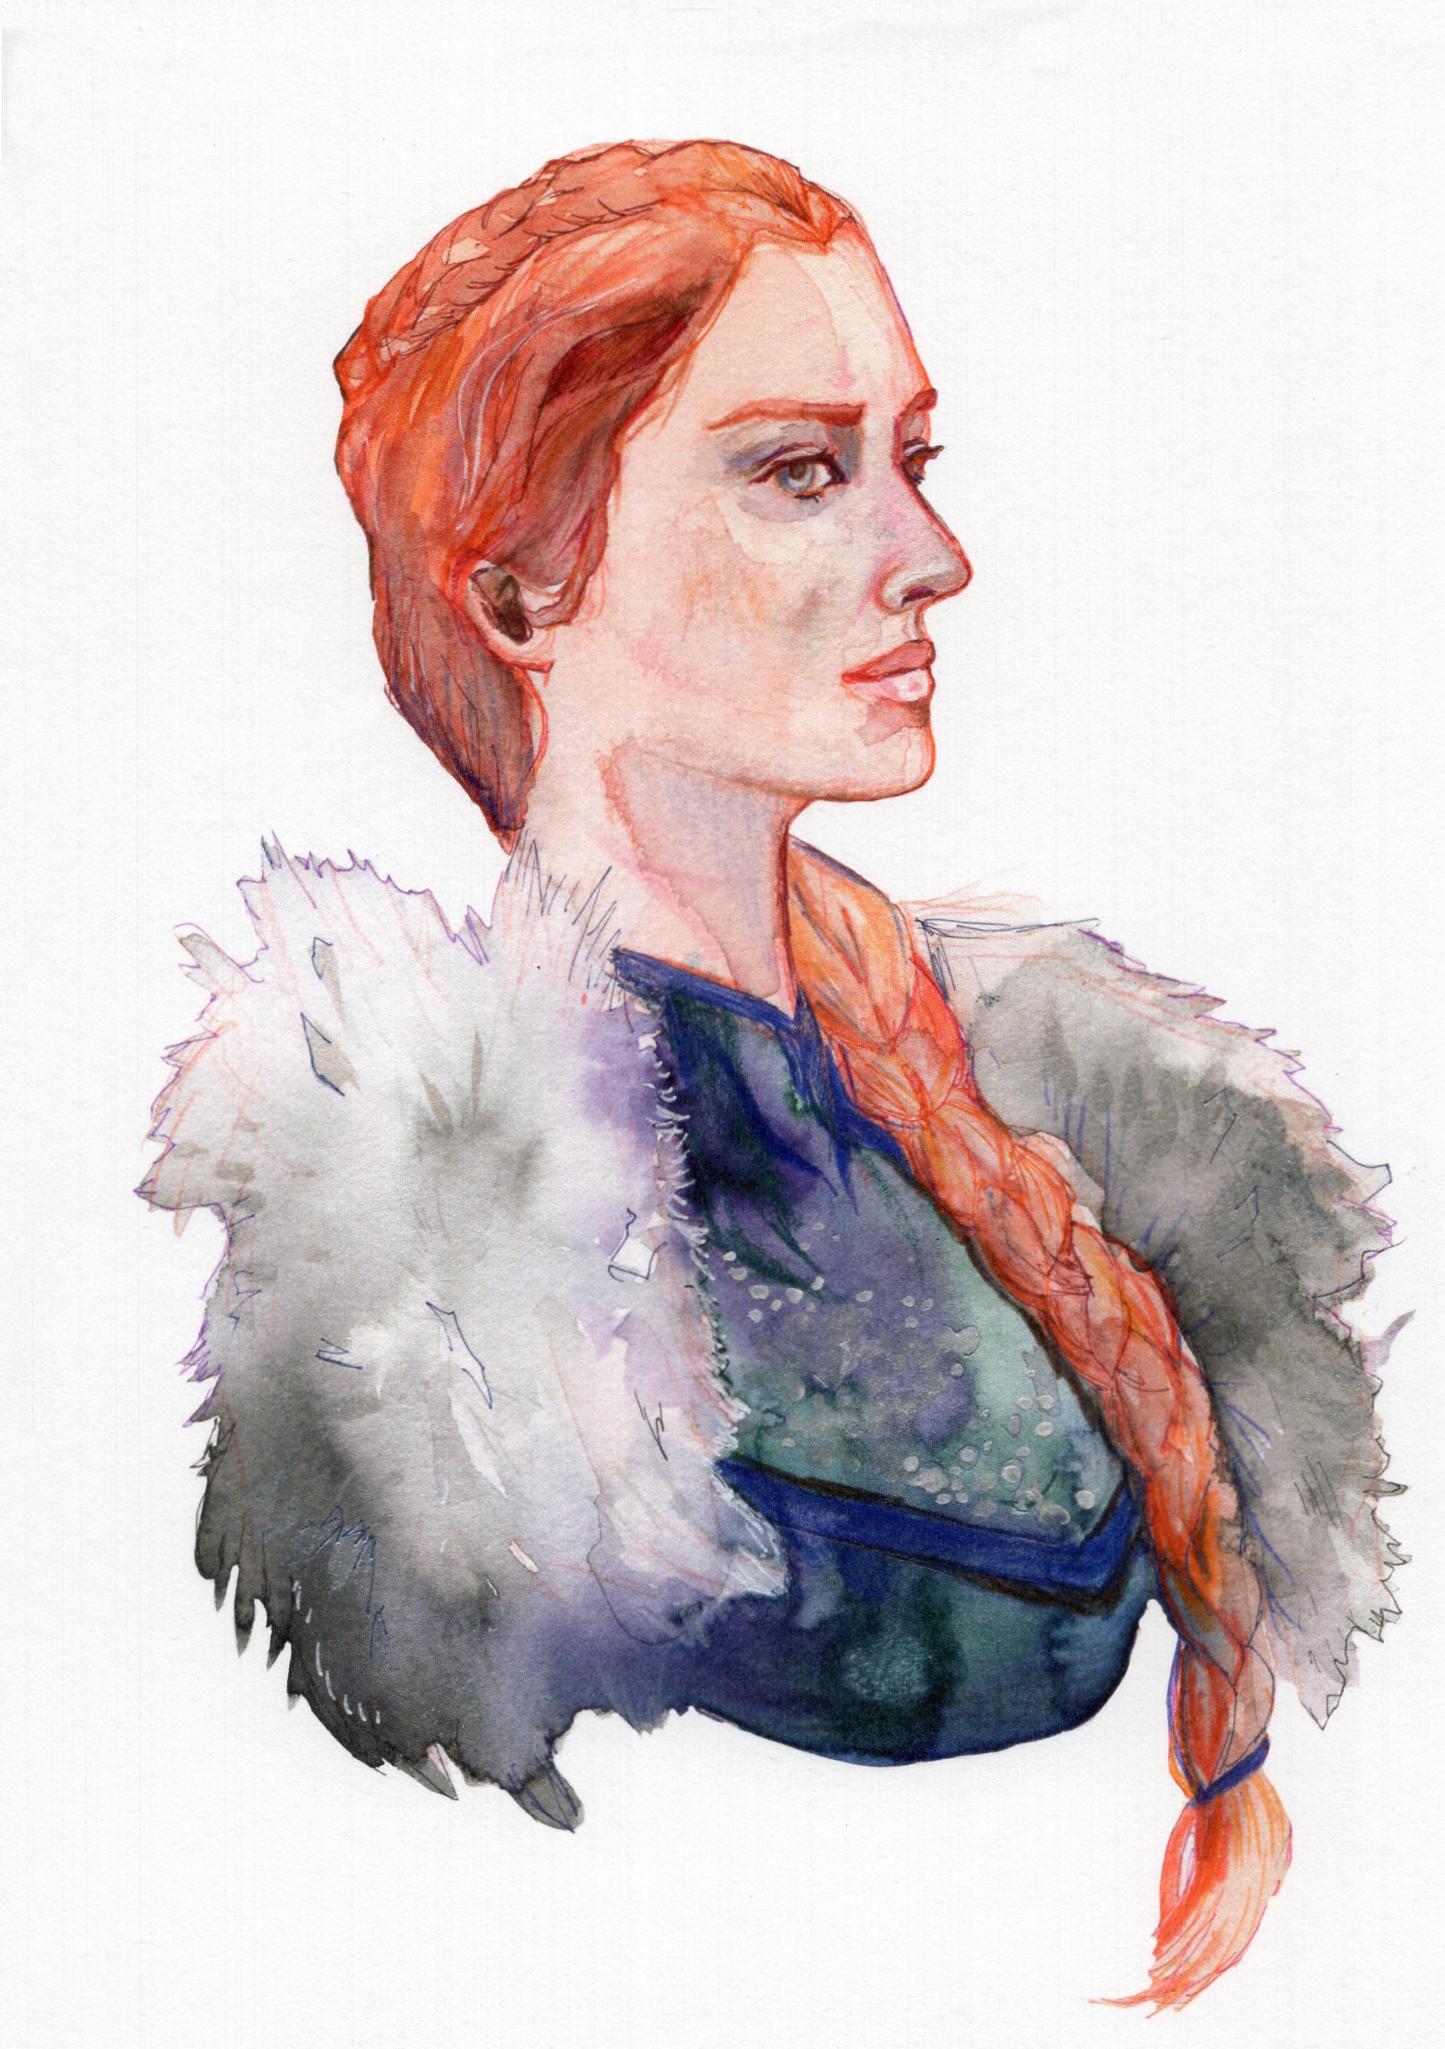 Sansa-Scan